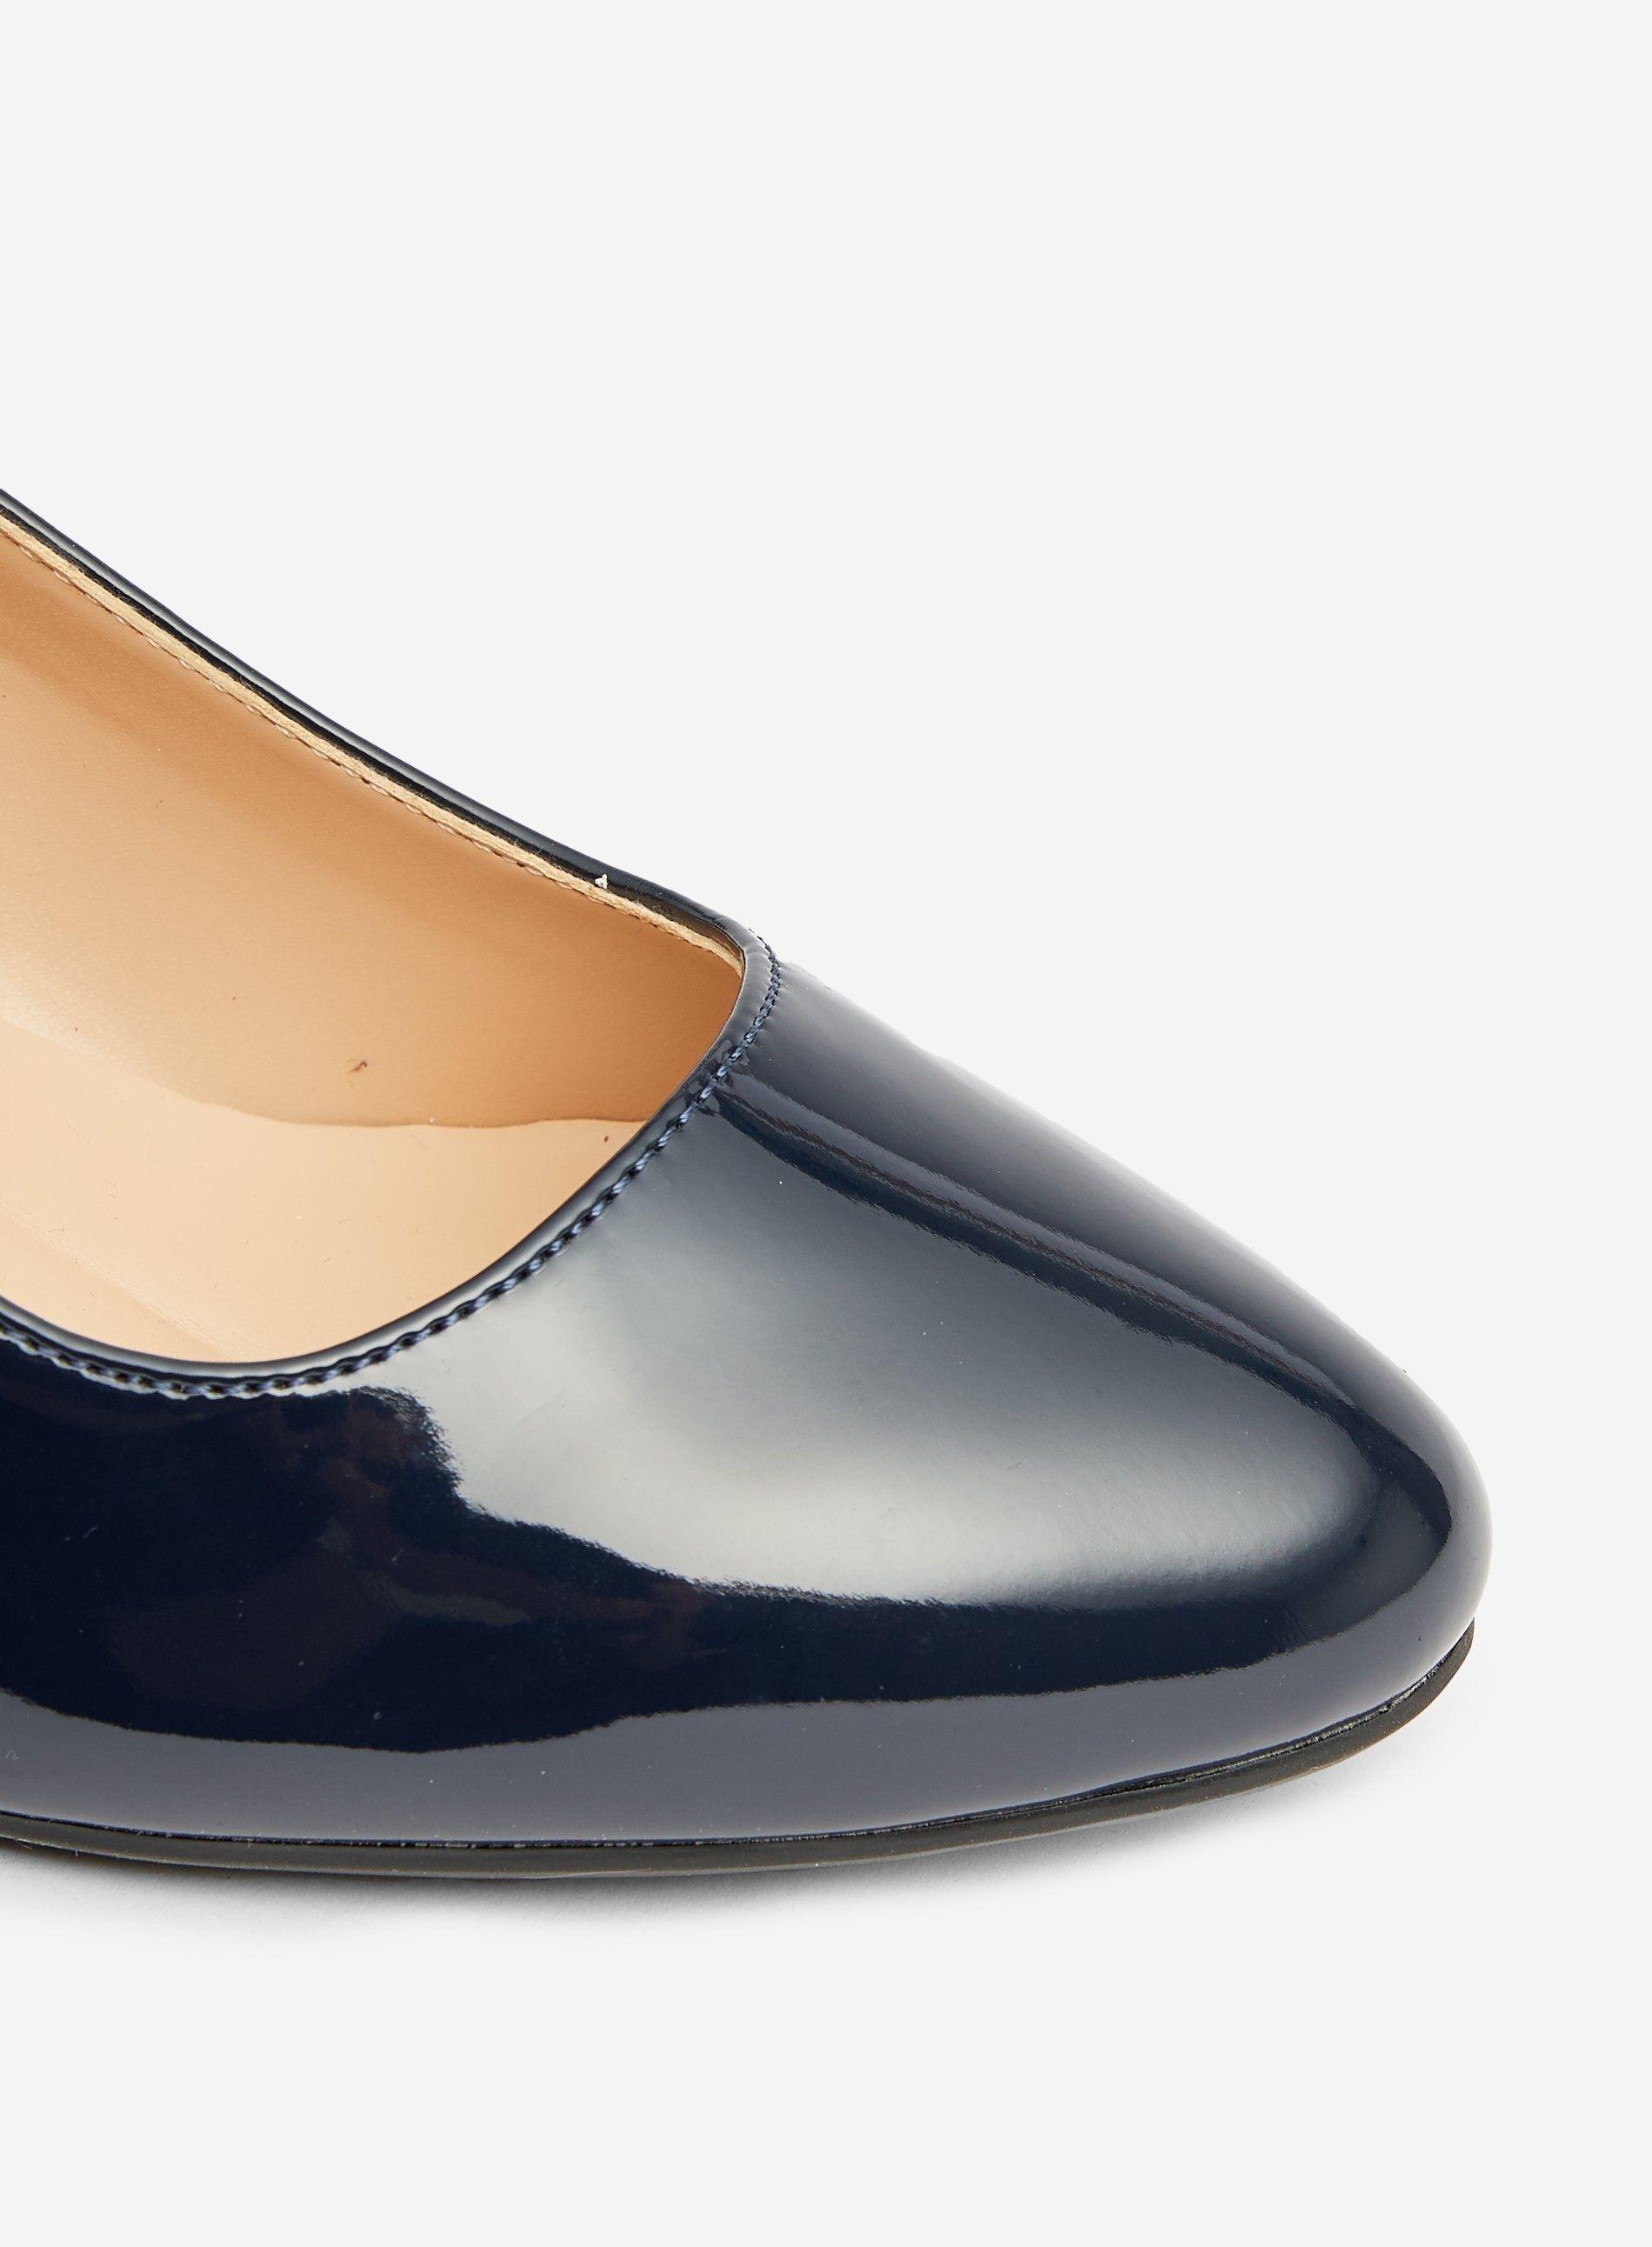 Dorothy Perkins Womens Wide Fit Navy Comfort Dreamers Wedge Court Shoes Heels